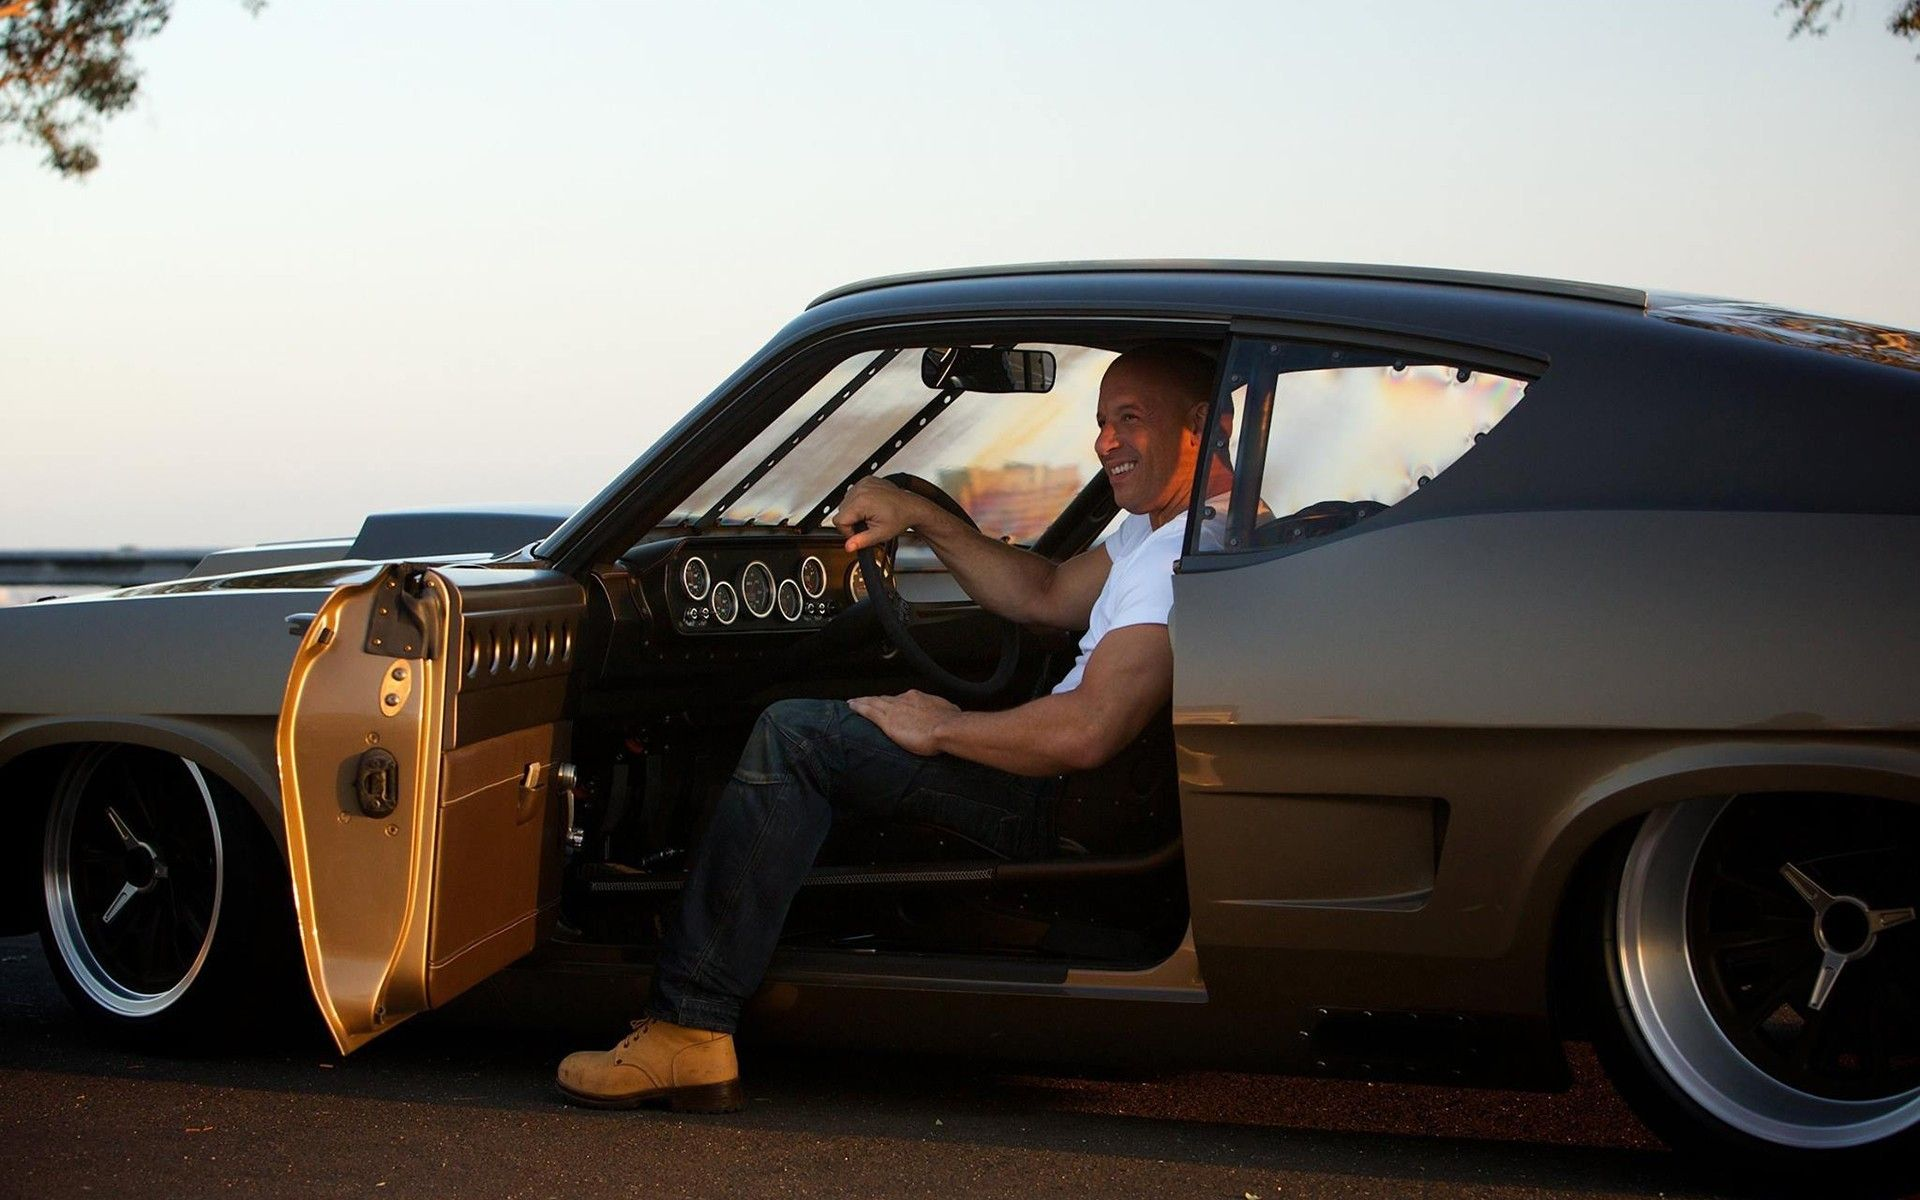 Vin Diesel Car Wallpaper Hd Zbo Movie Desktop Hd Wallpapers